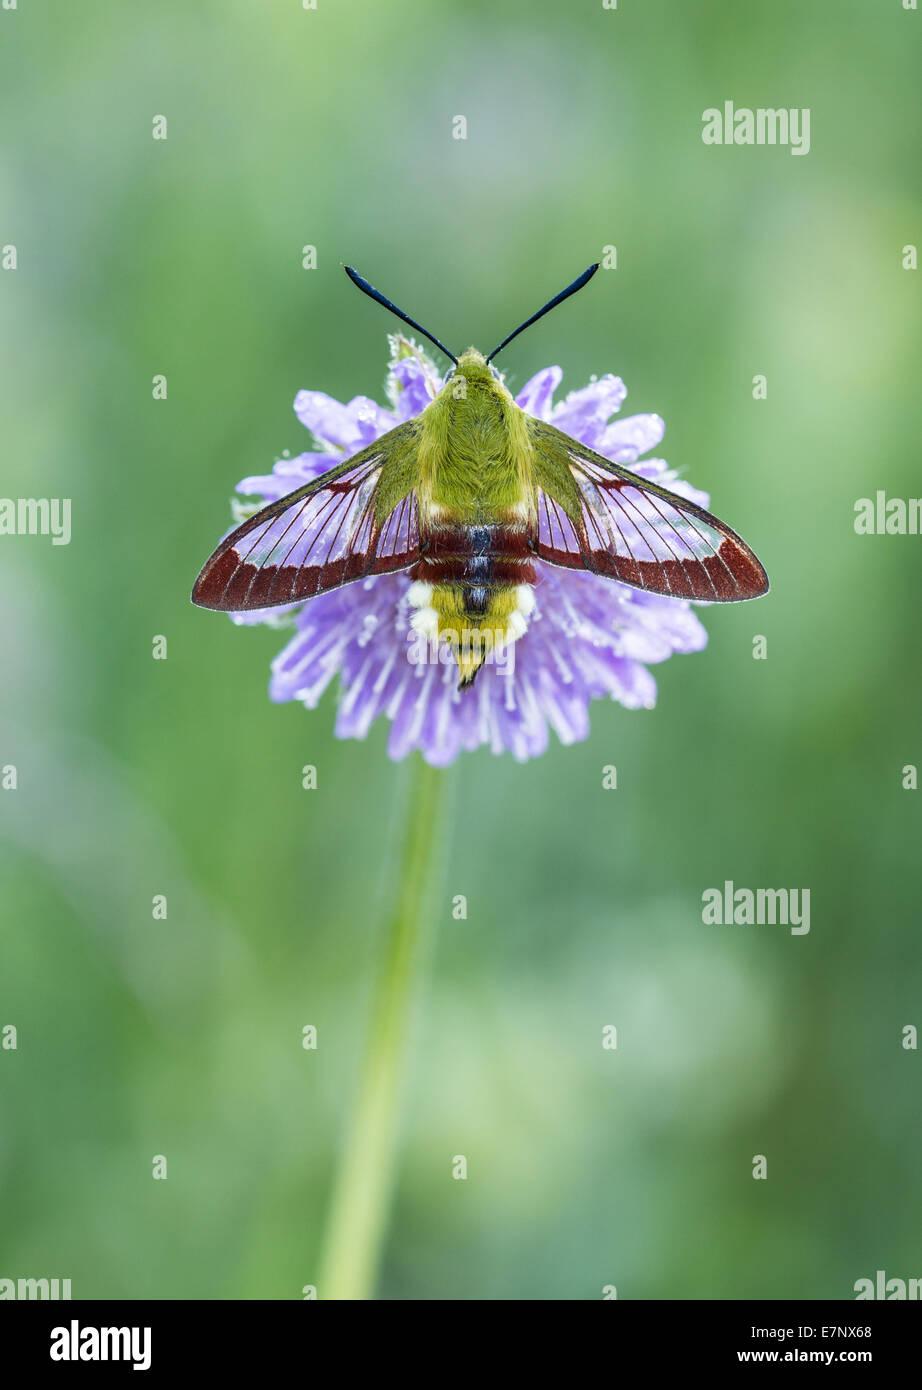 Animal, Insekt, Moth, Hawk Moth, Hemaris fuciformis, Broad-bordered Bee Hawk-moth, Sphingidae, Switzerland - Stock Image